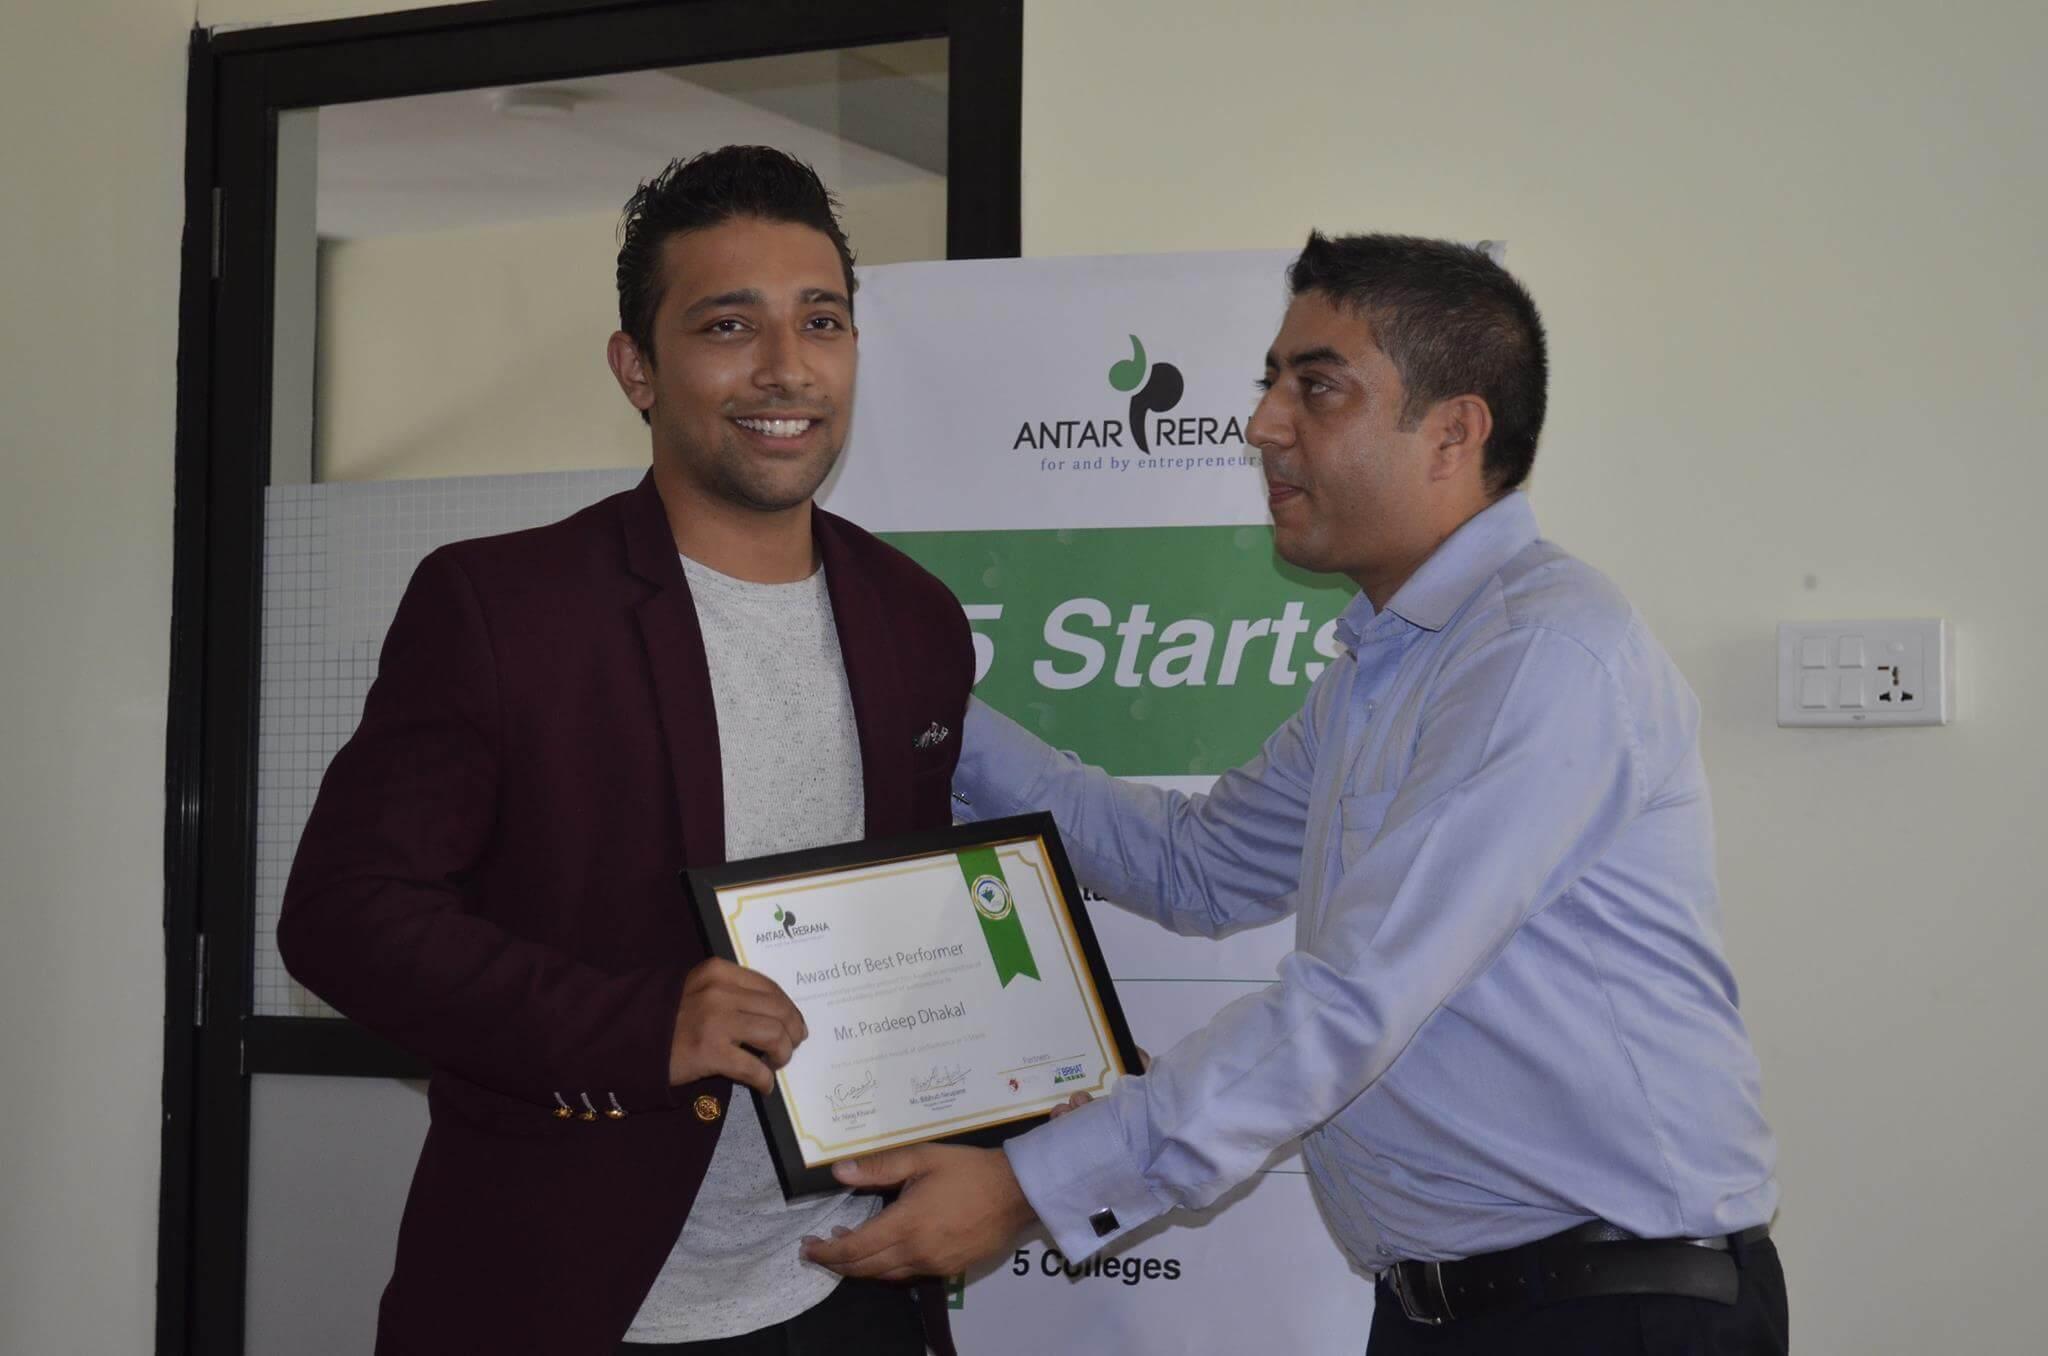 Pradeep and Sushant Win 5 Starts Competition Organized by Antarprerana